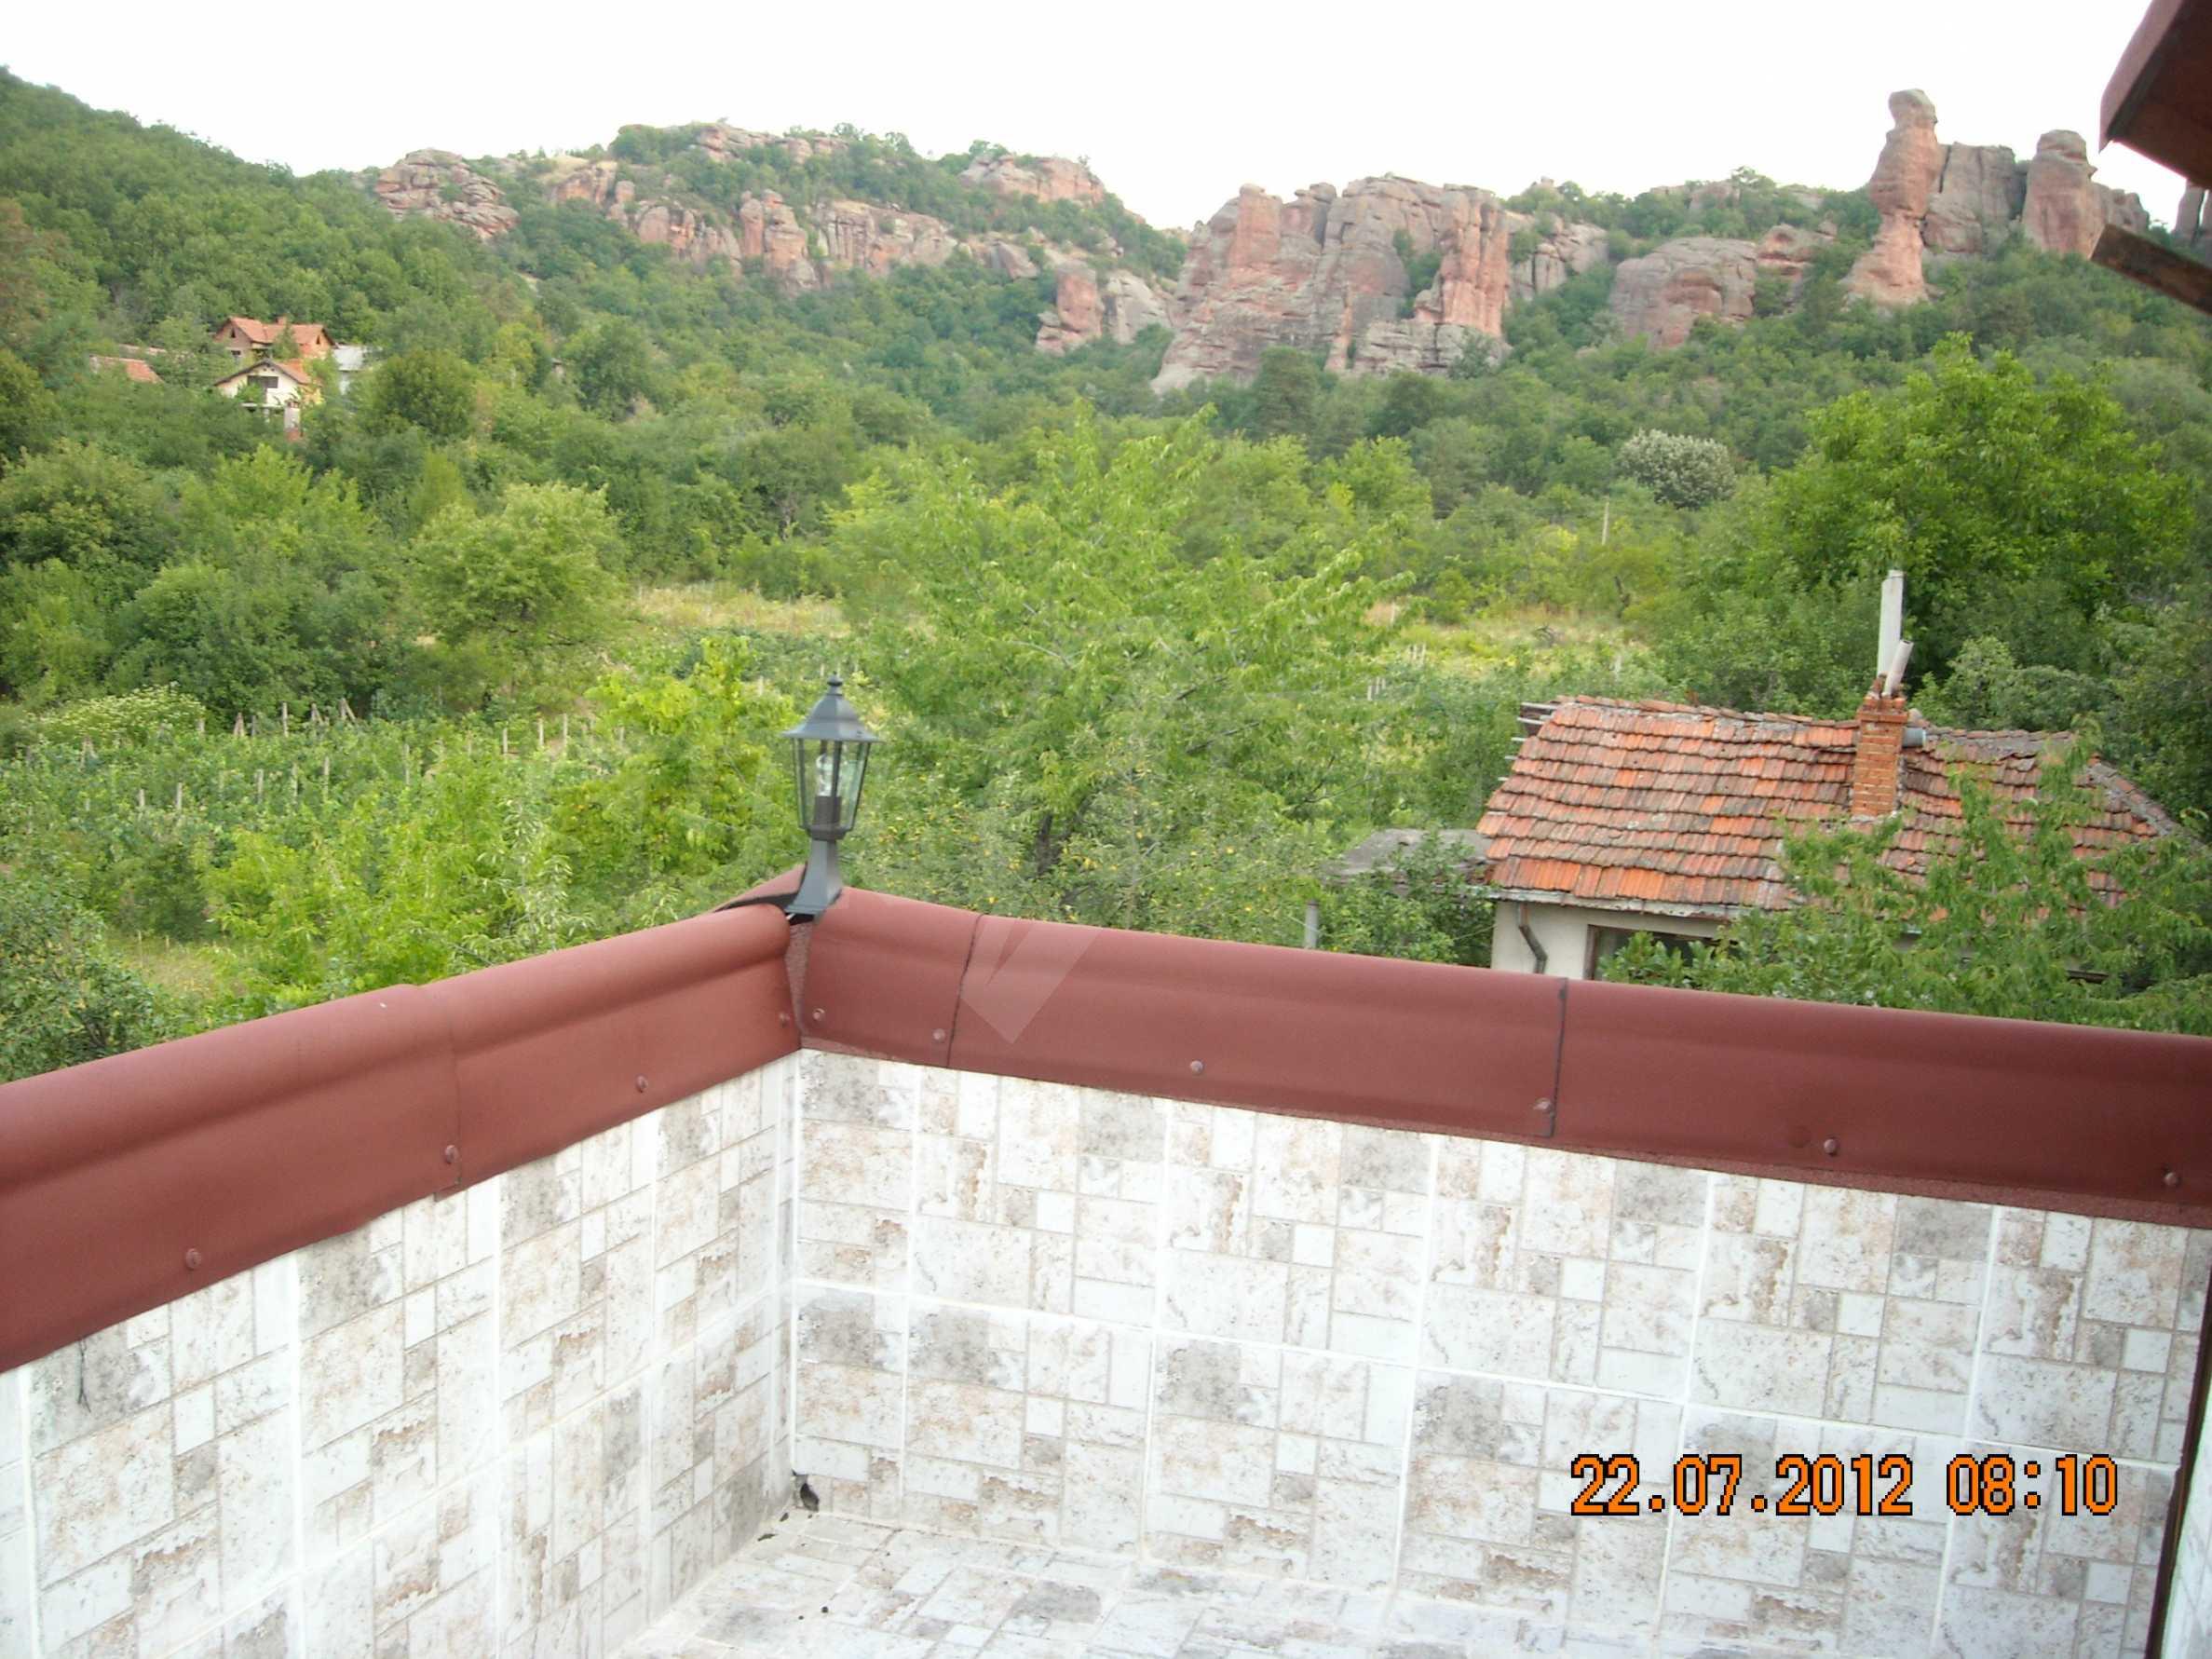 3-storey villa with garden and small plunge pool near Belogradchik 22